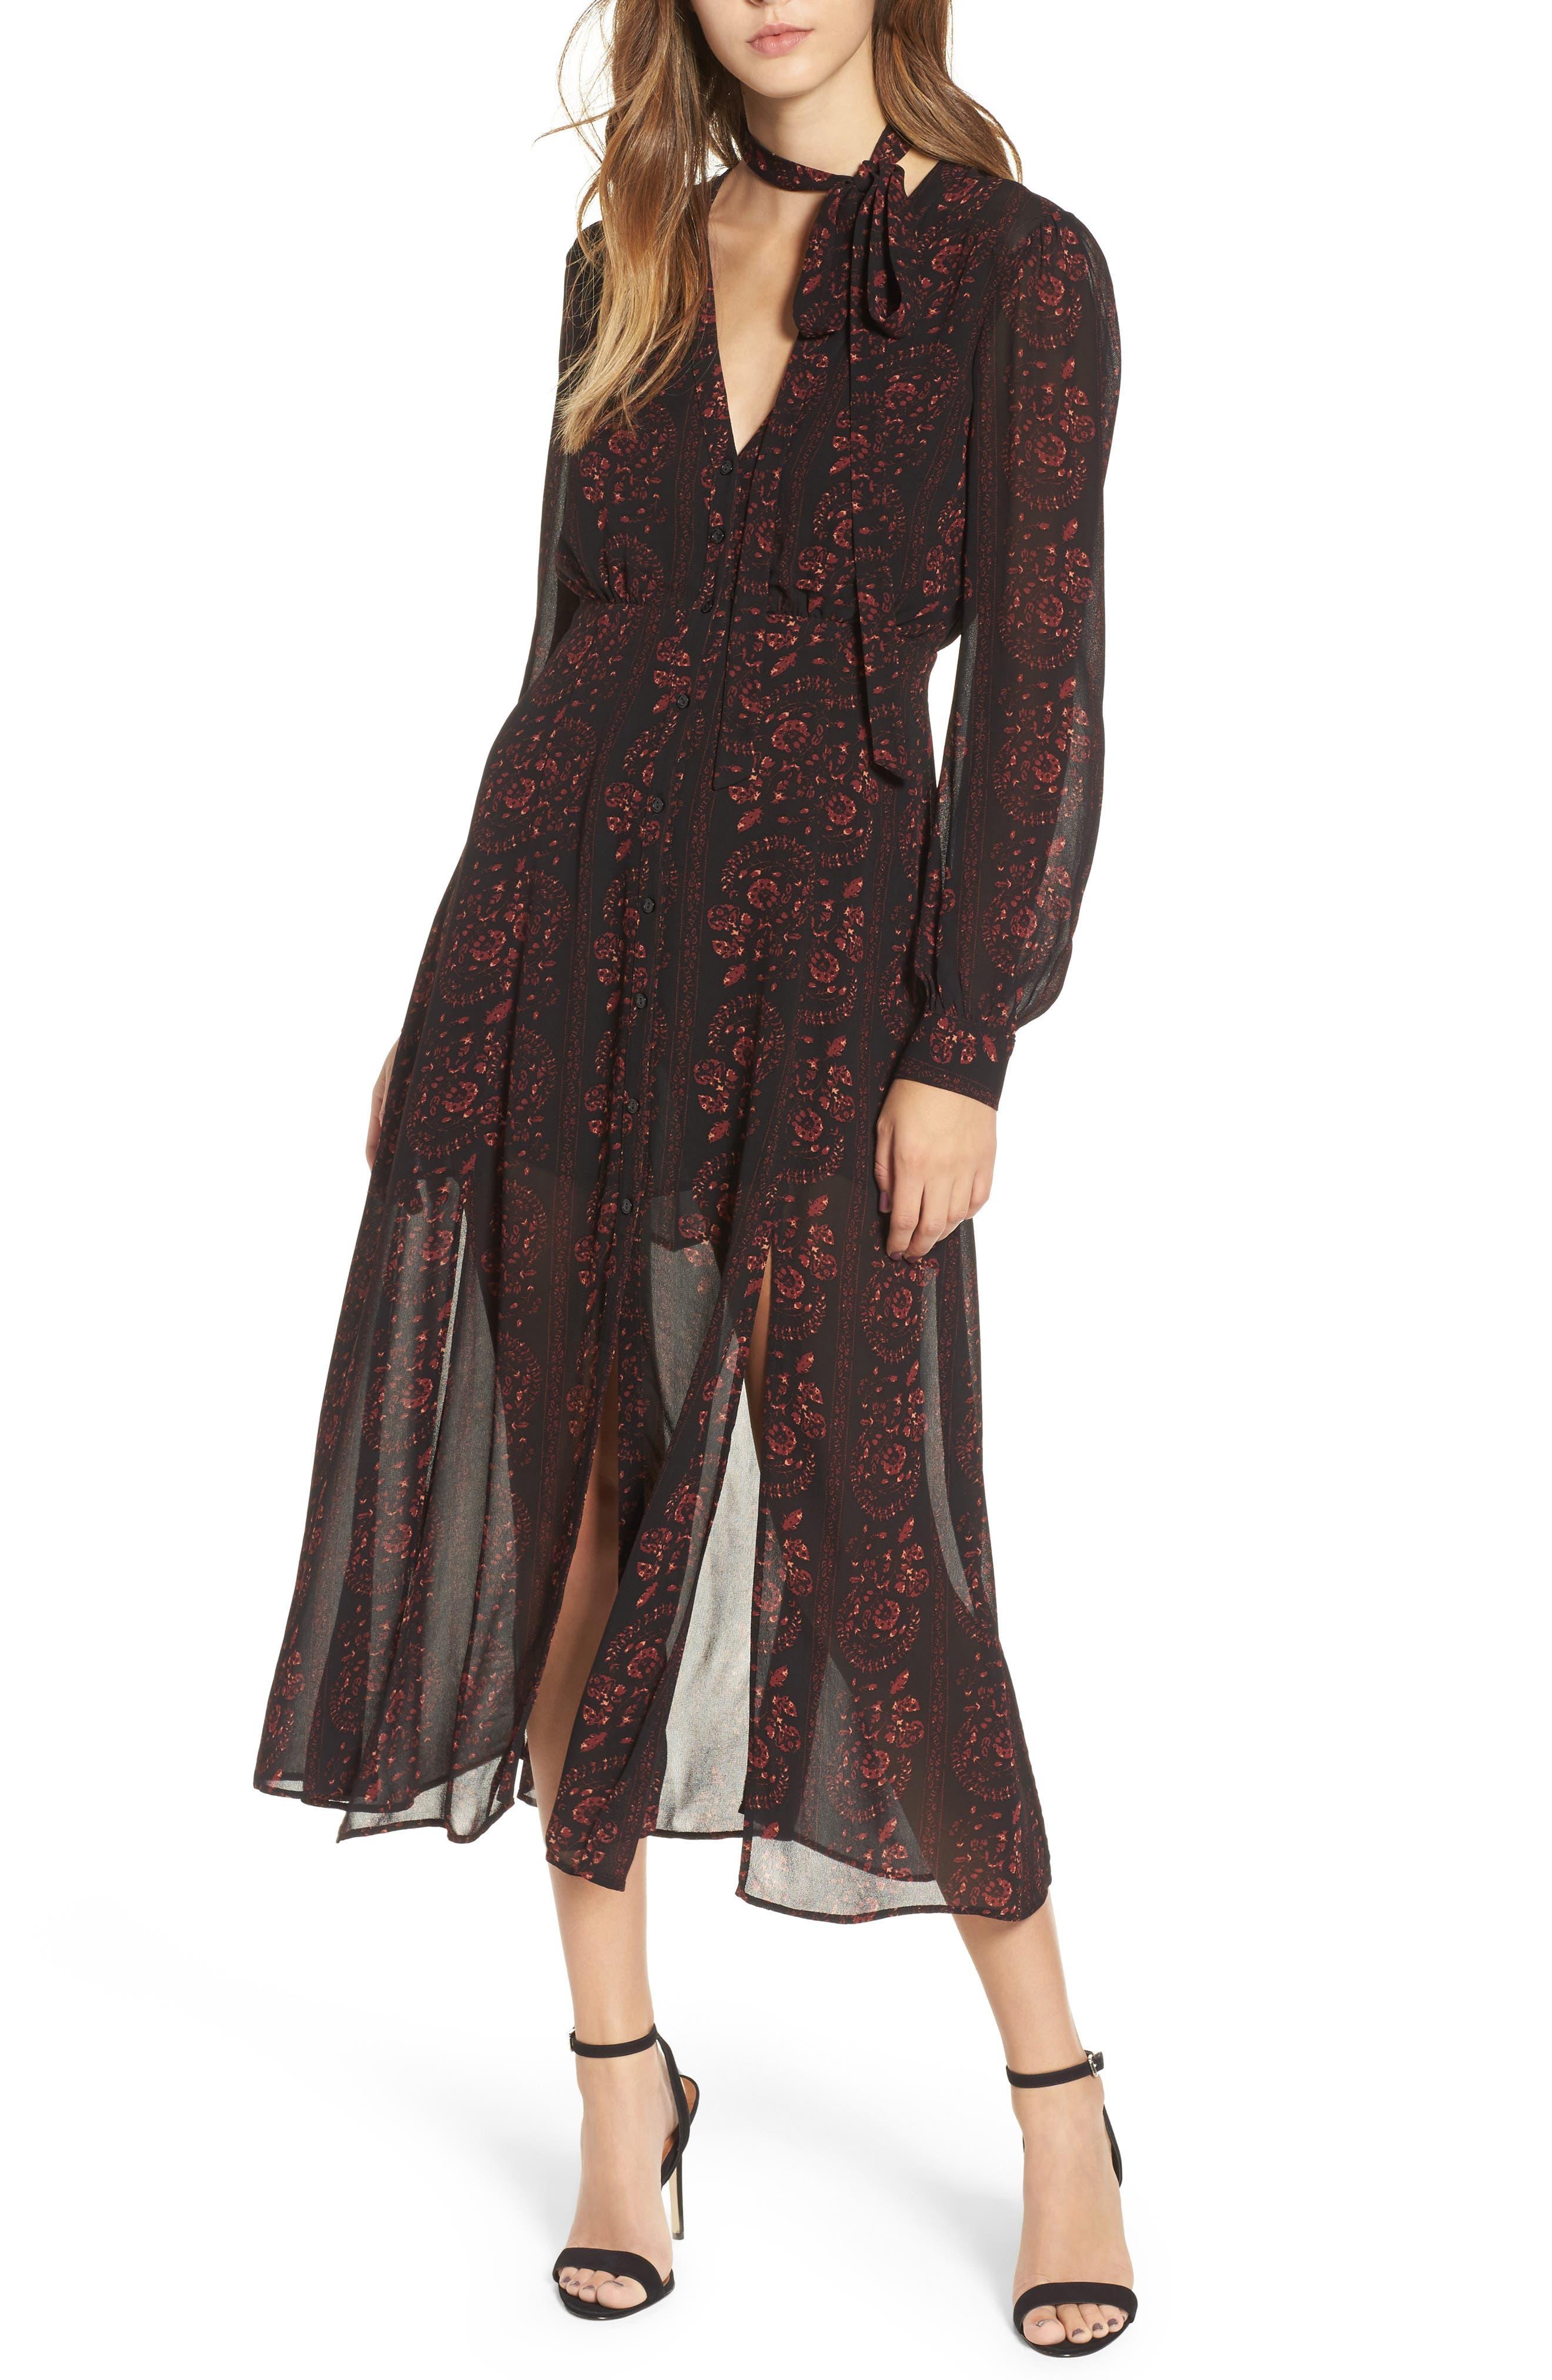 Main Image - ASTR the Label Natalie Midi Dress